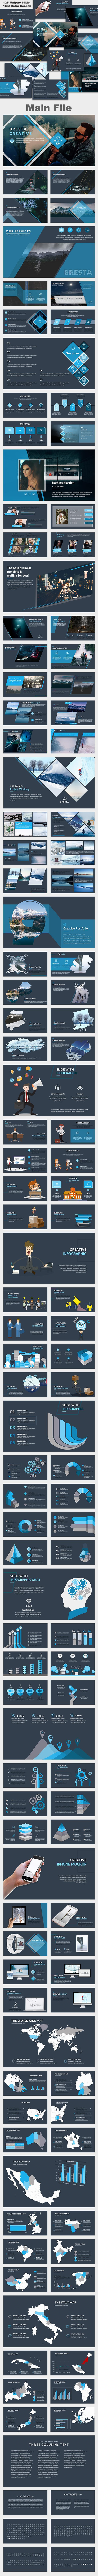 Bresta Creative Keynote Template - Creative Keynote Templates